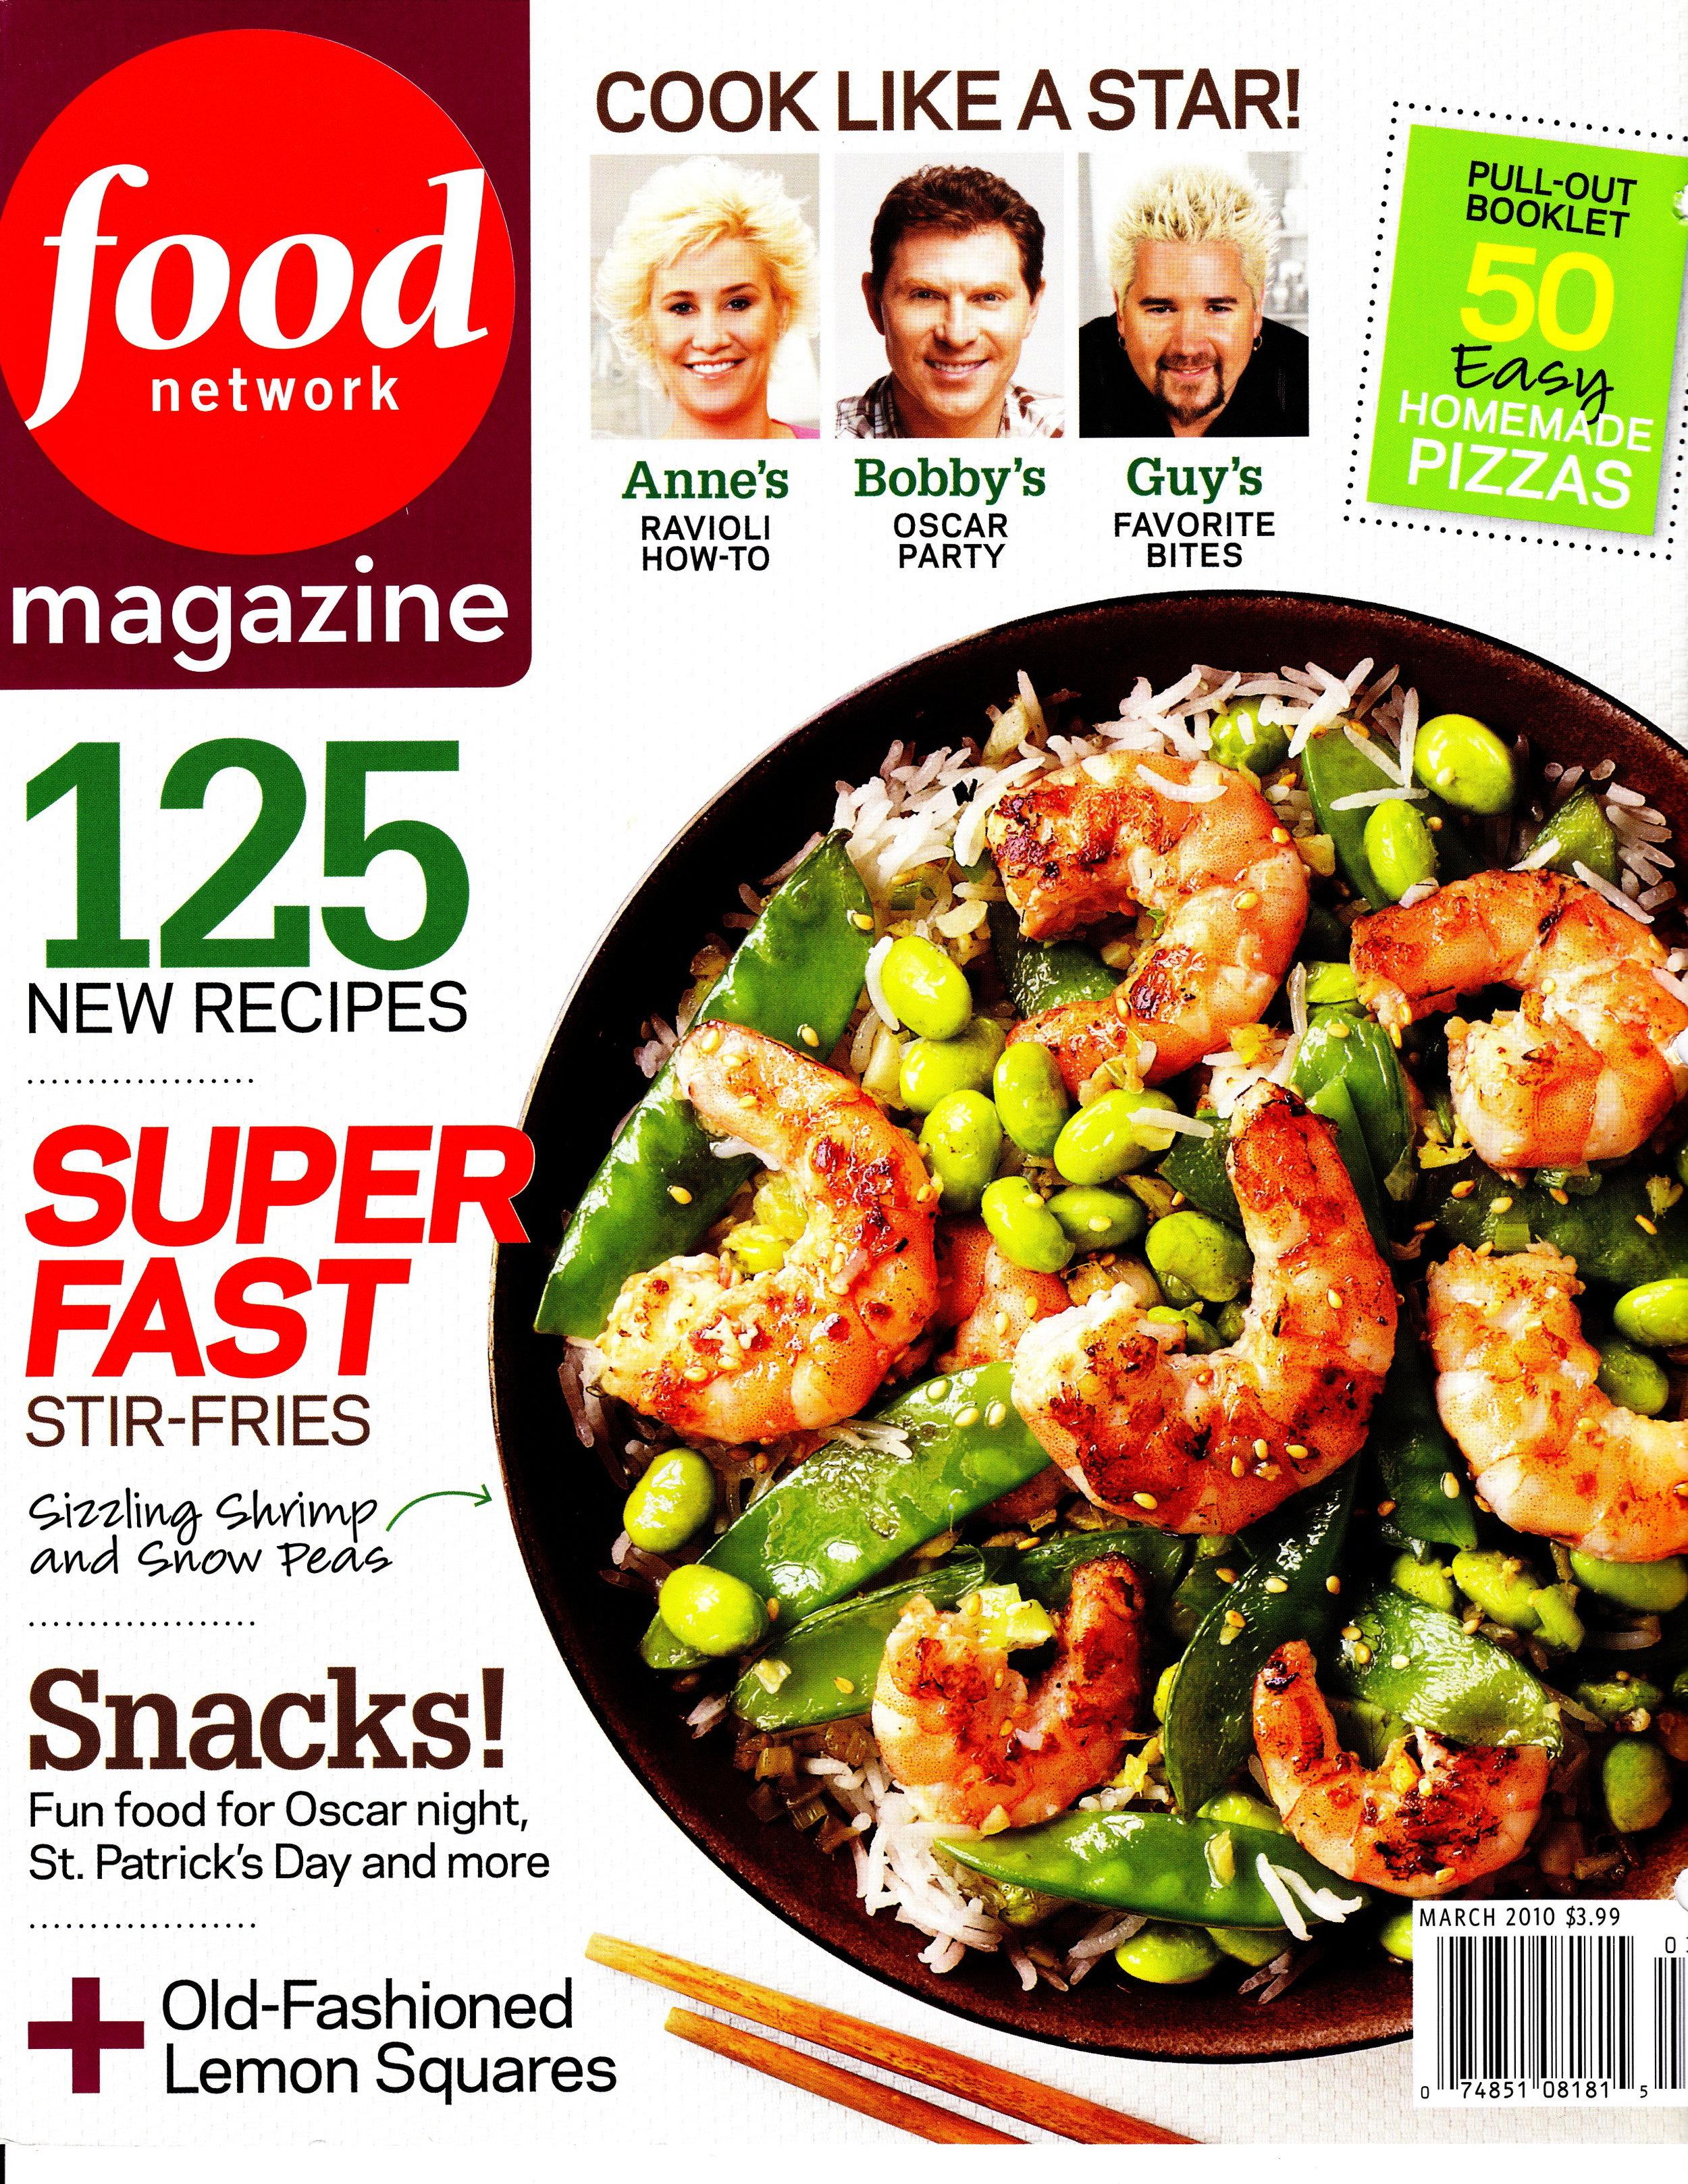 2010 March Food Network Magazine.jpg